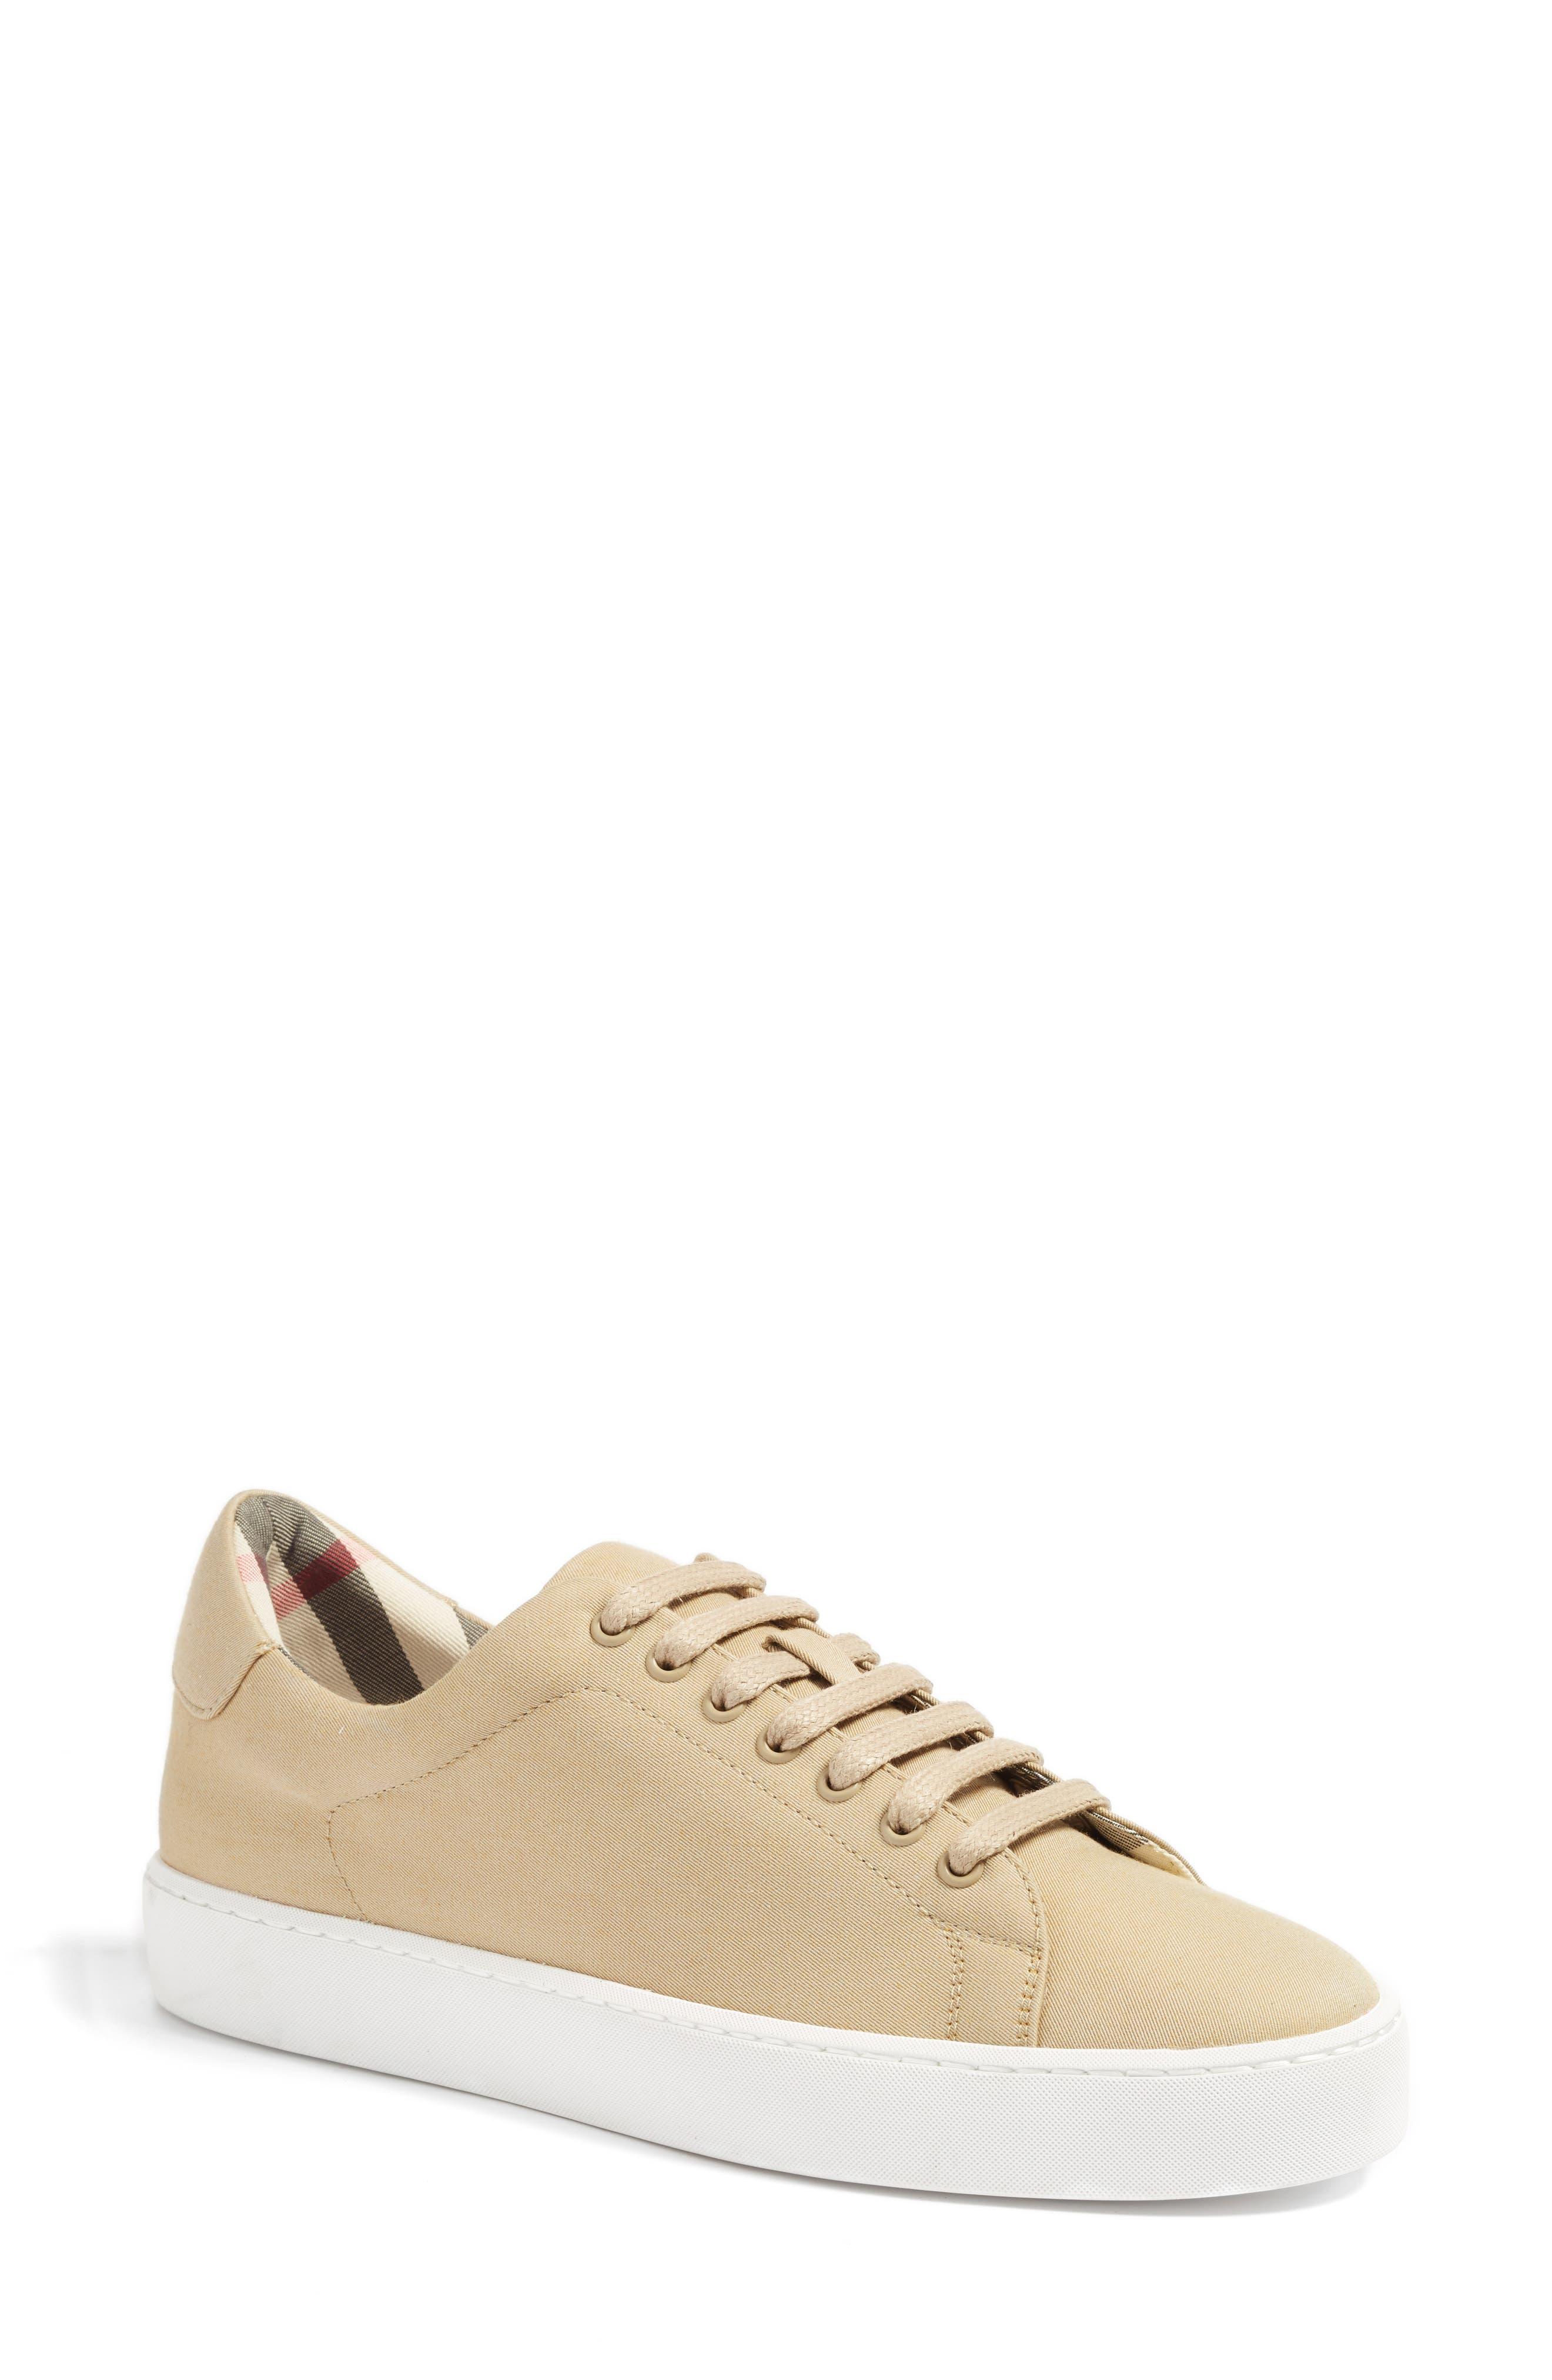 Alternate Image 1 Selected - Burberry Westford Sneaker (Women)